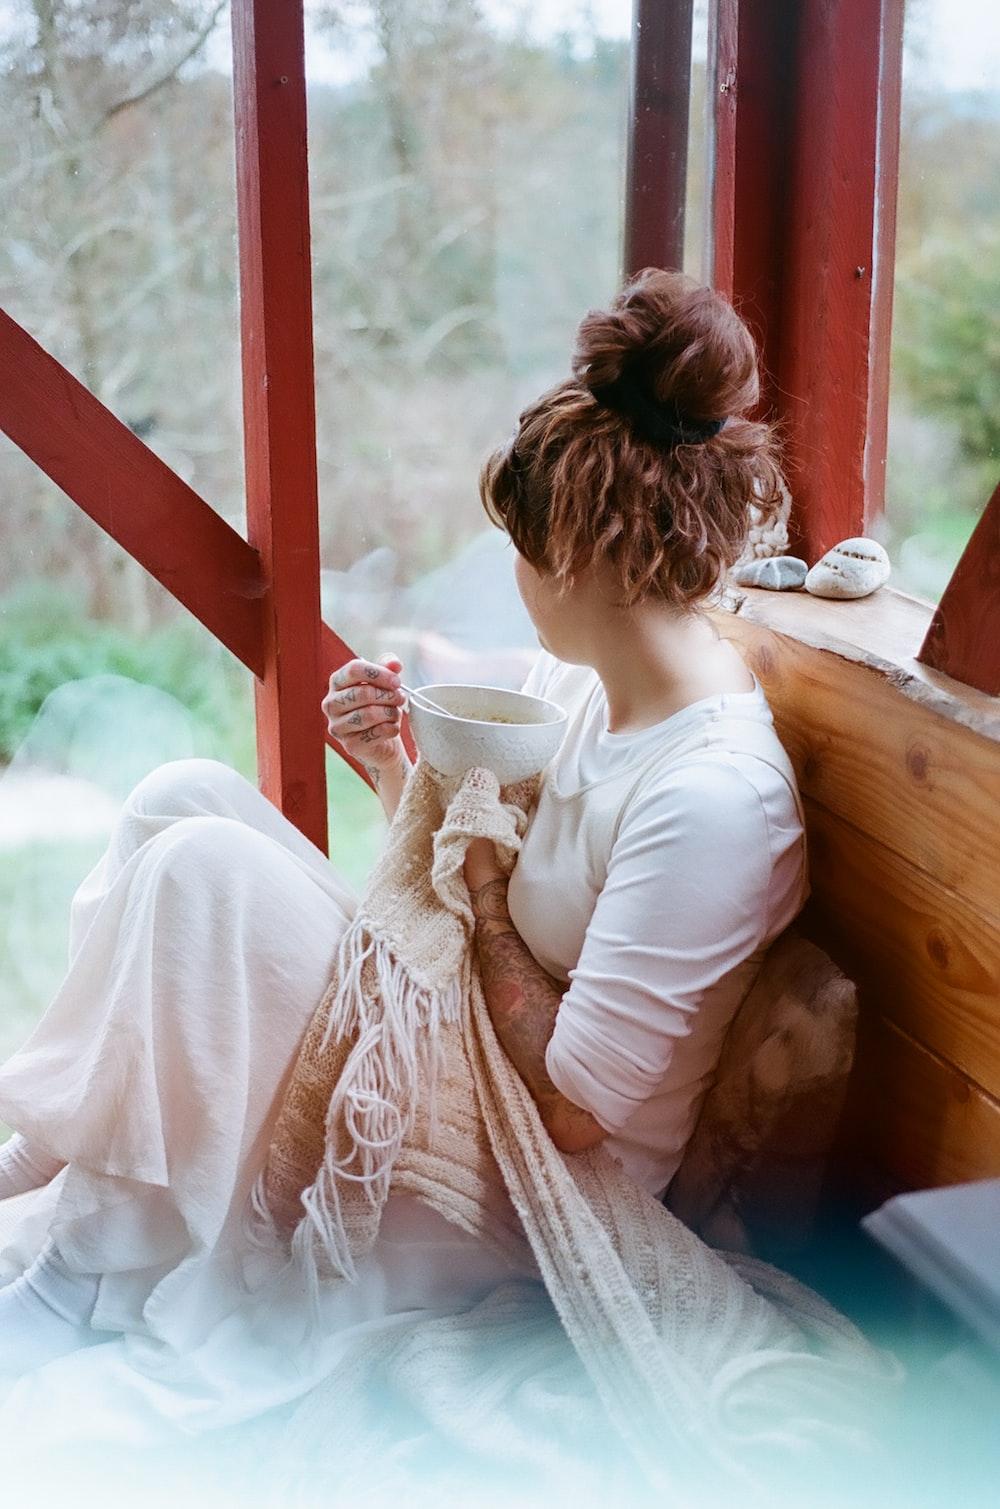 woman in white dress holding white ceramic mug